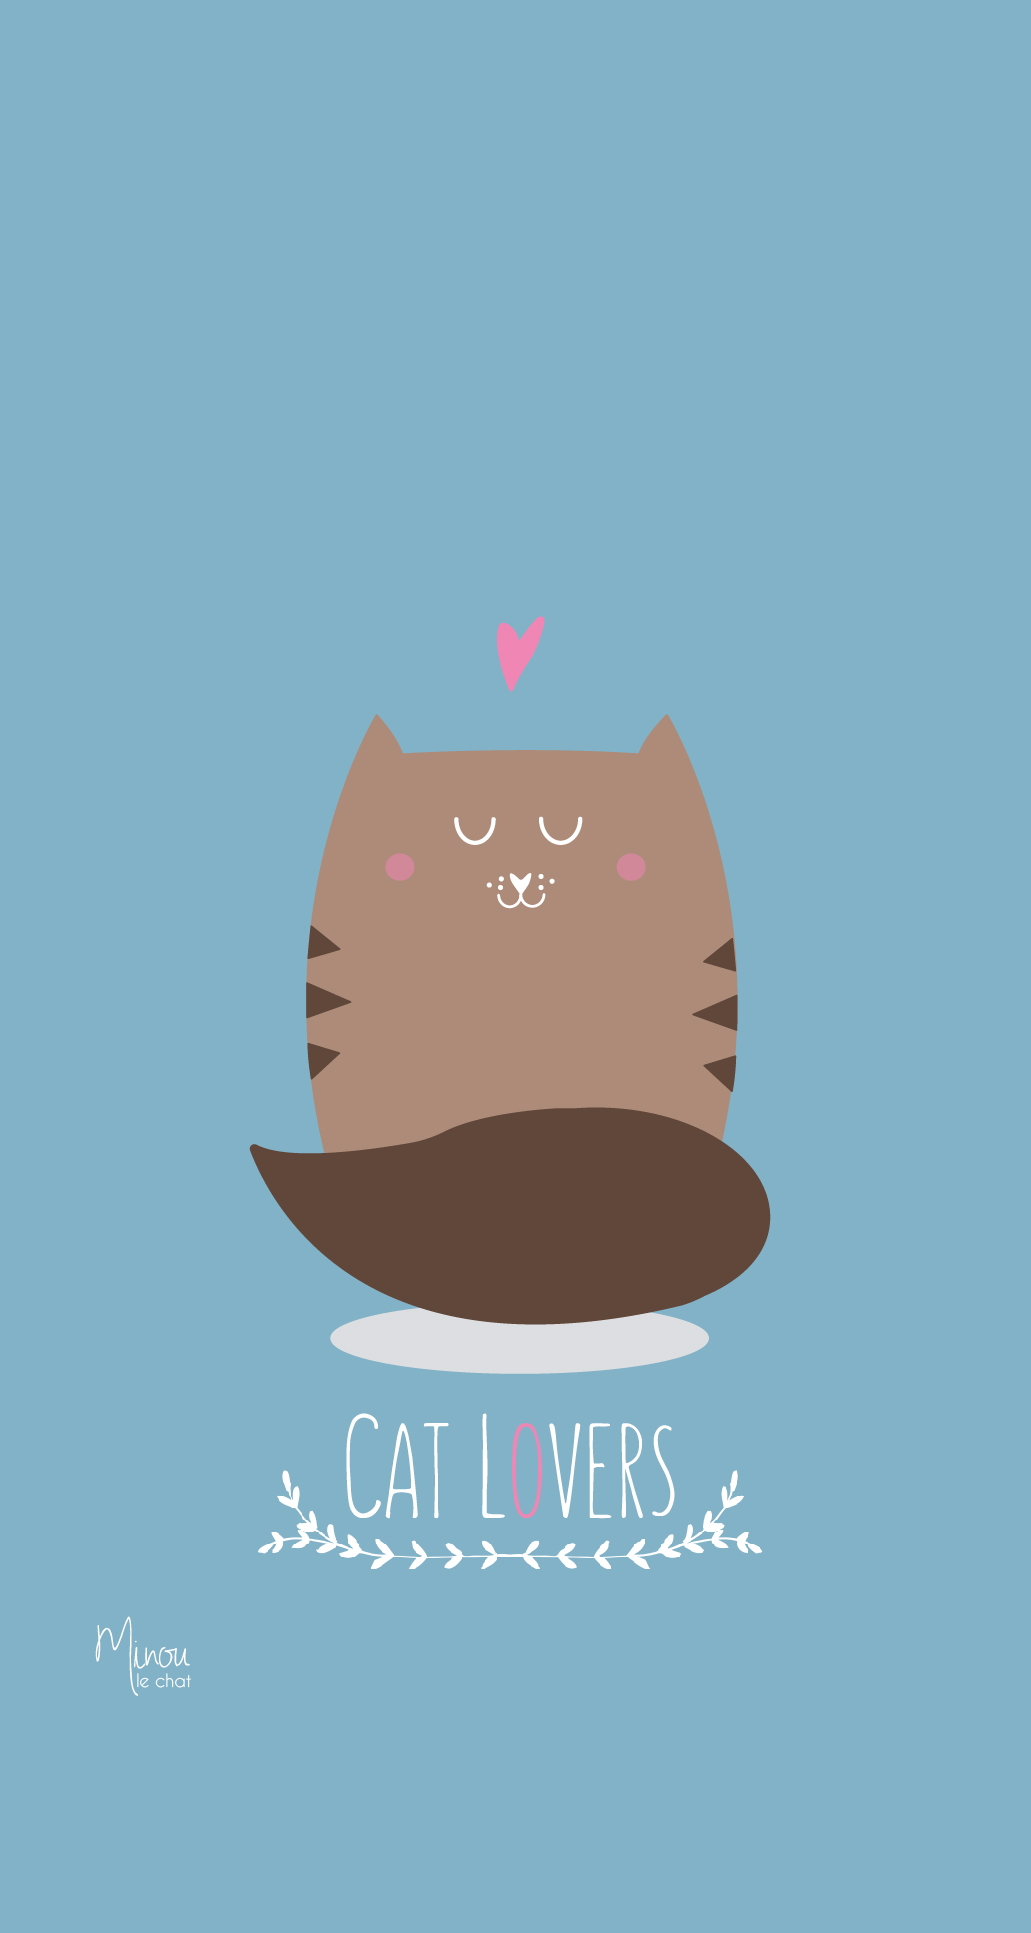 Fond d 39 cran cat lovers minou le chat for Fond ecran iphone original